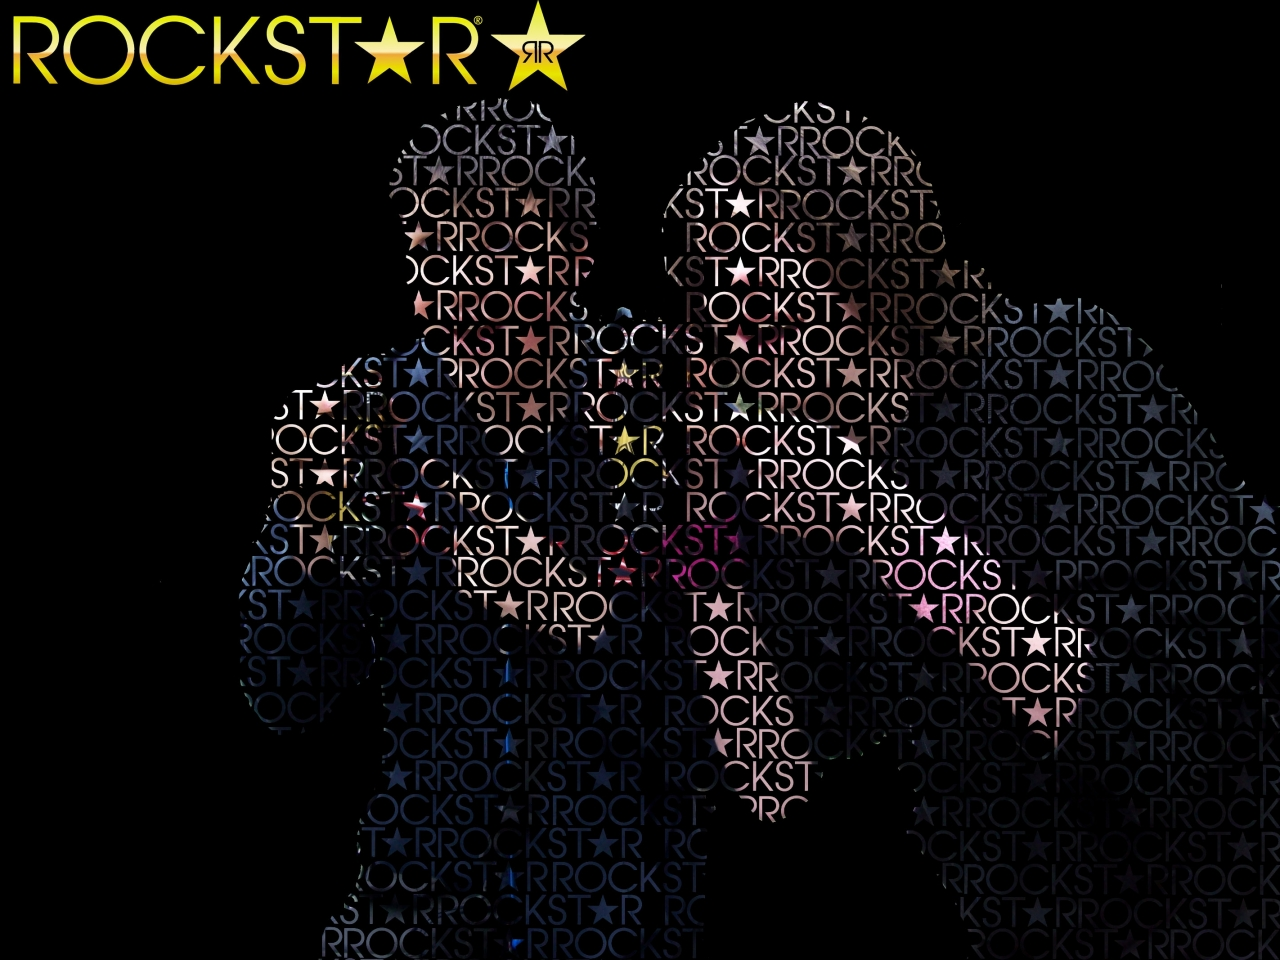 Rockstar Energy Drink Wallpaper 5 Background Wallpaper 1280x960